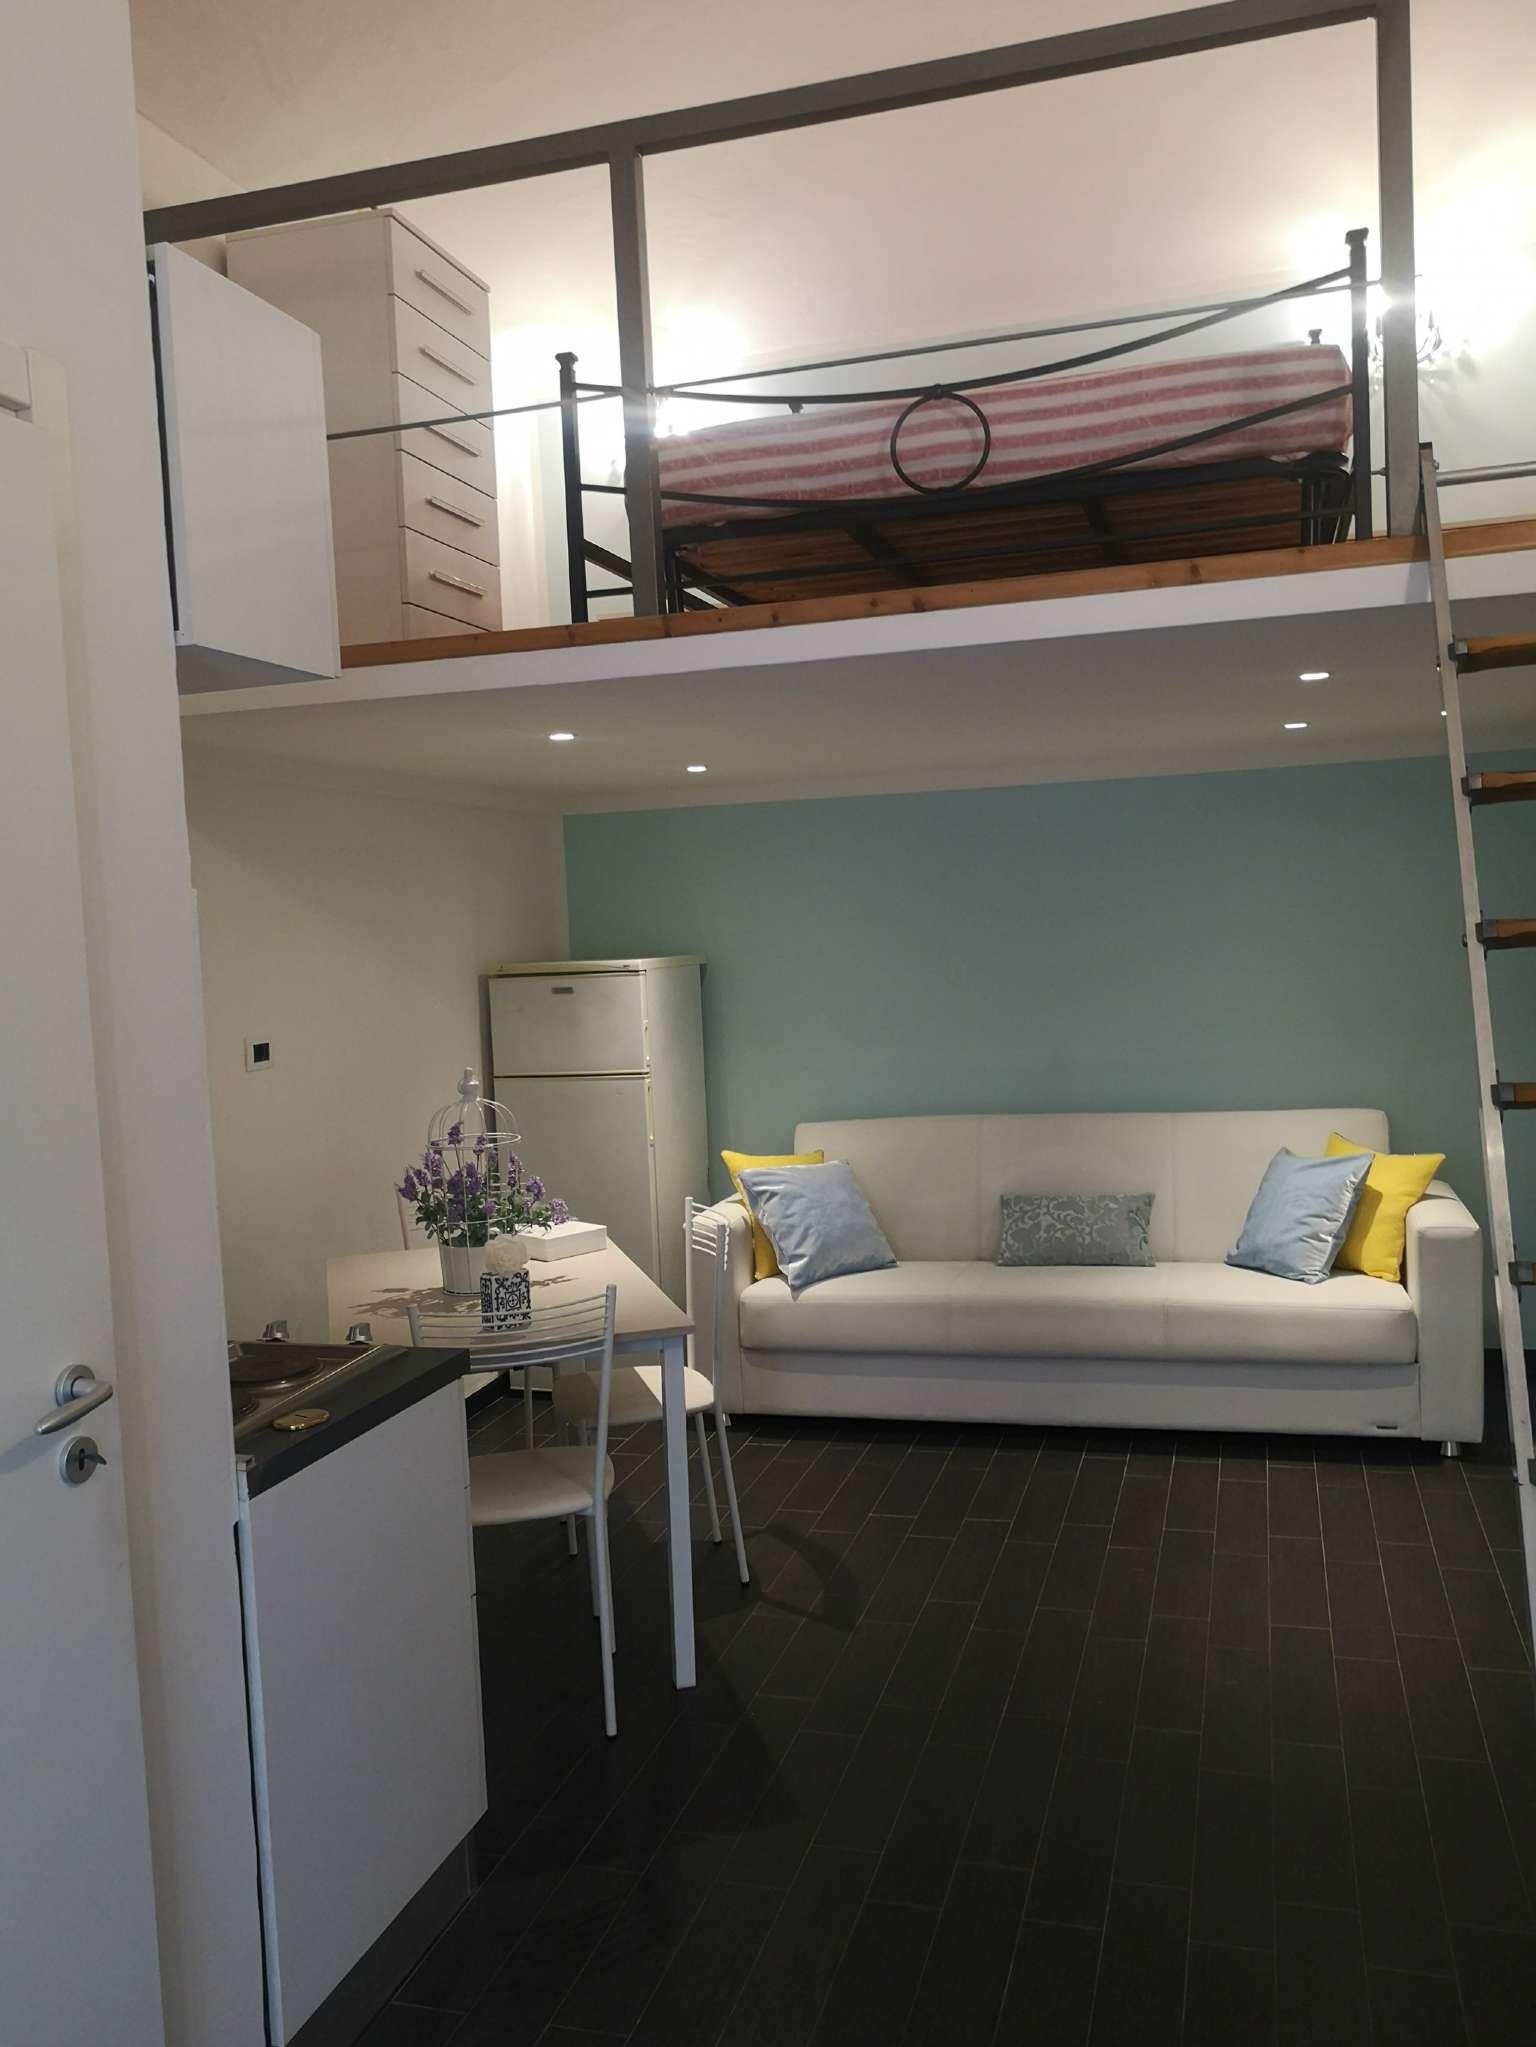 Appartamento in vendita Zona San Salvario - via ormea Torino